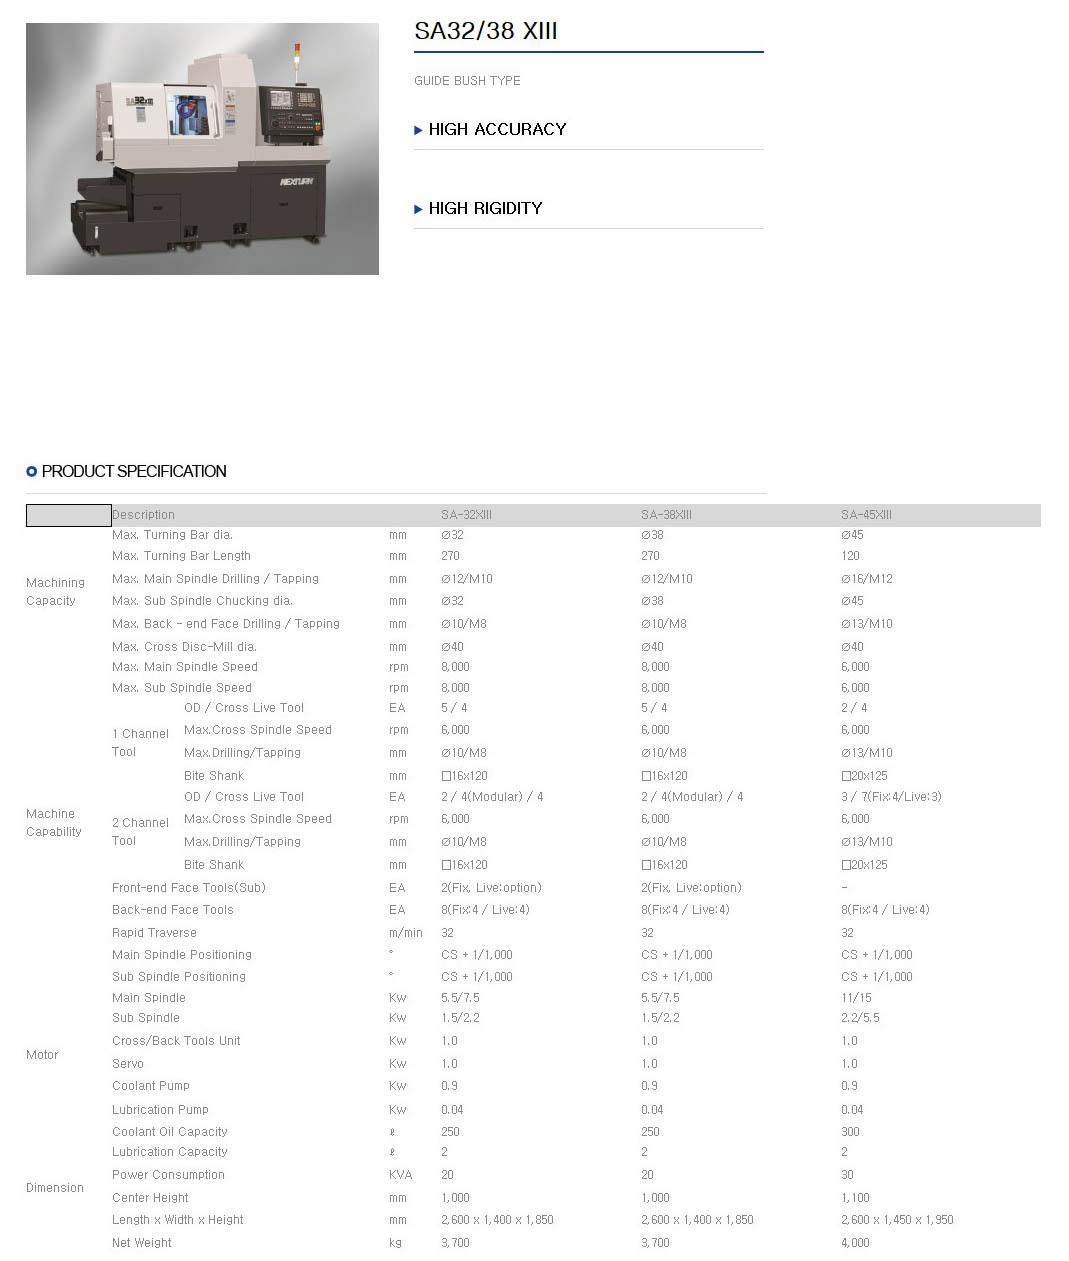 NEXTURN Guide Bush Type CNC Automatic Lathe SA-Series